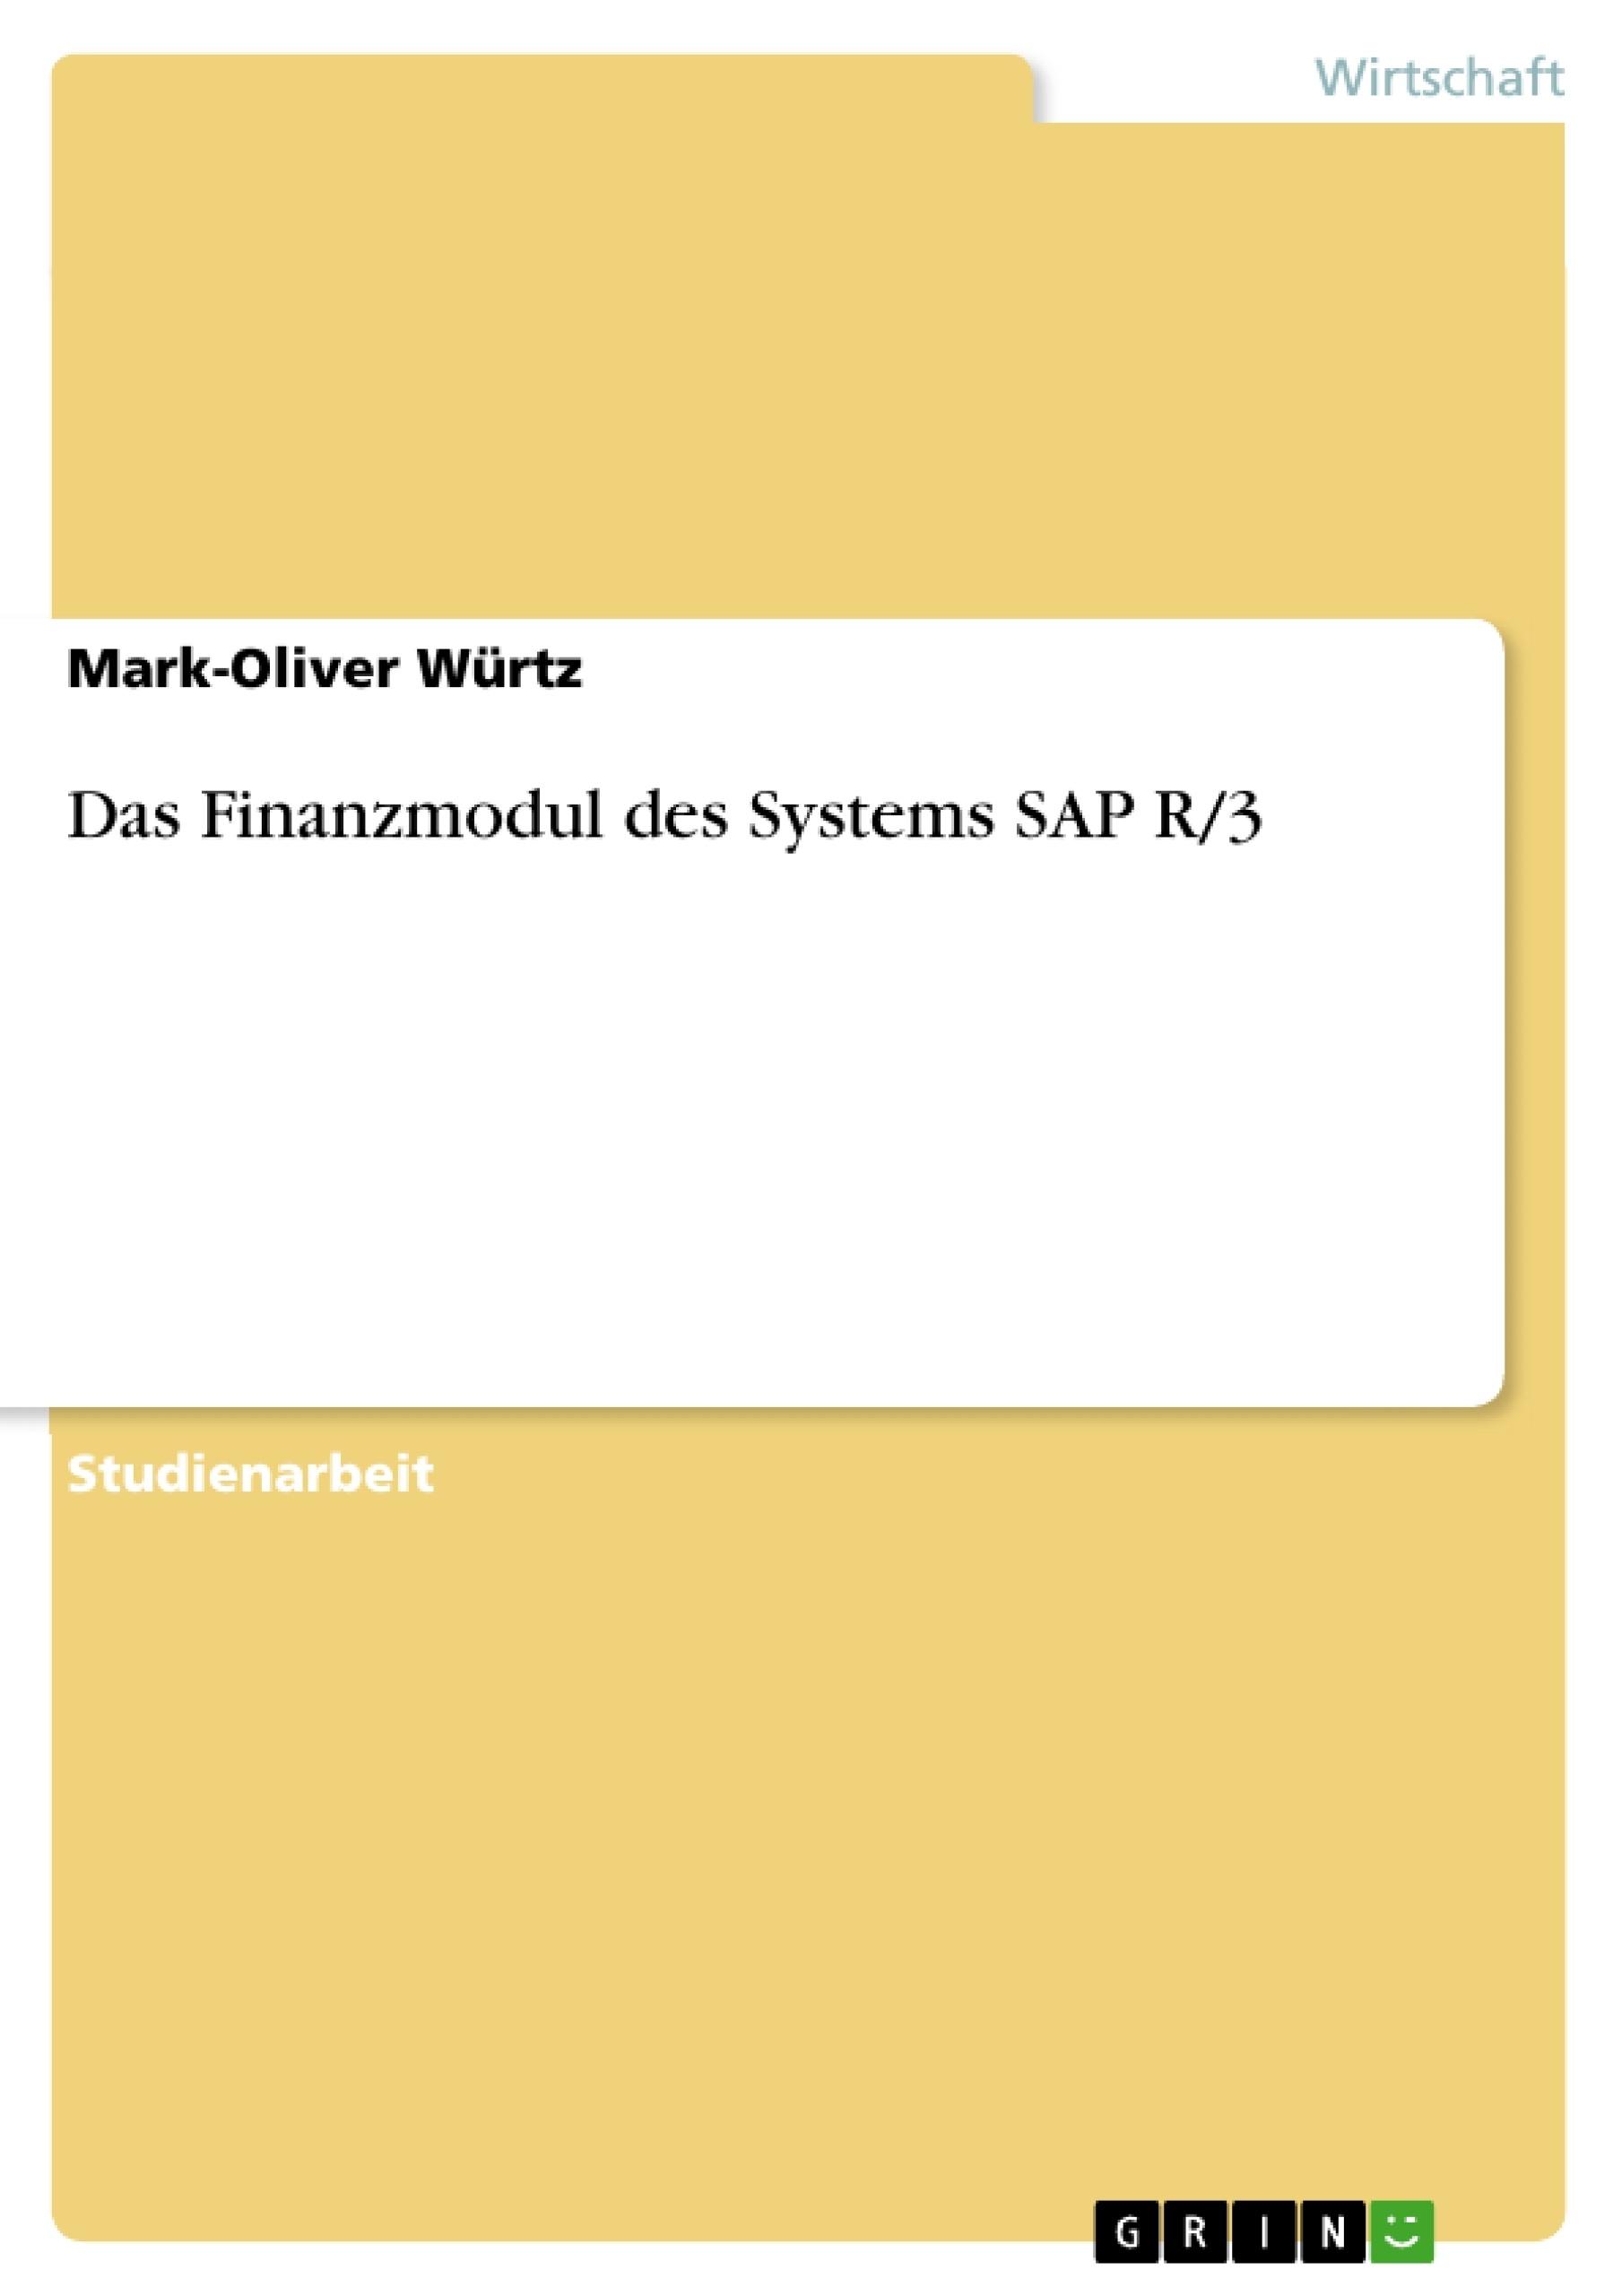 Titel: Das Finanzmodul des Systems SAP R/3